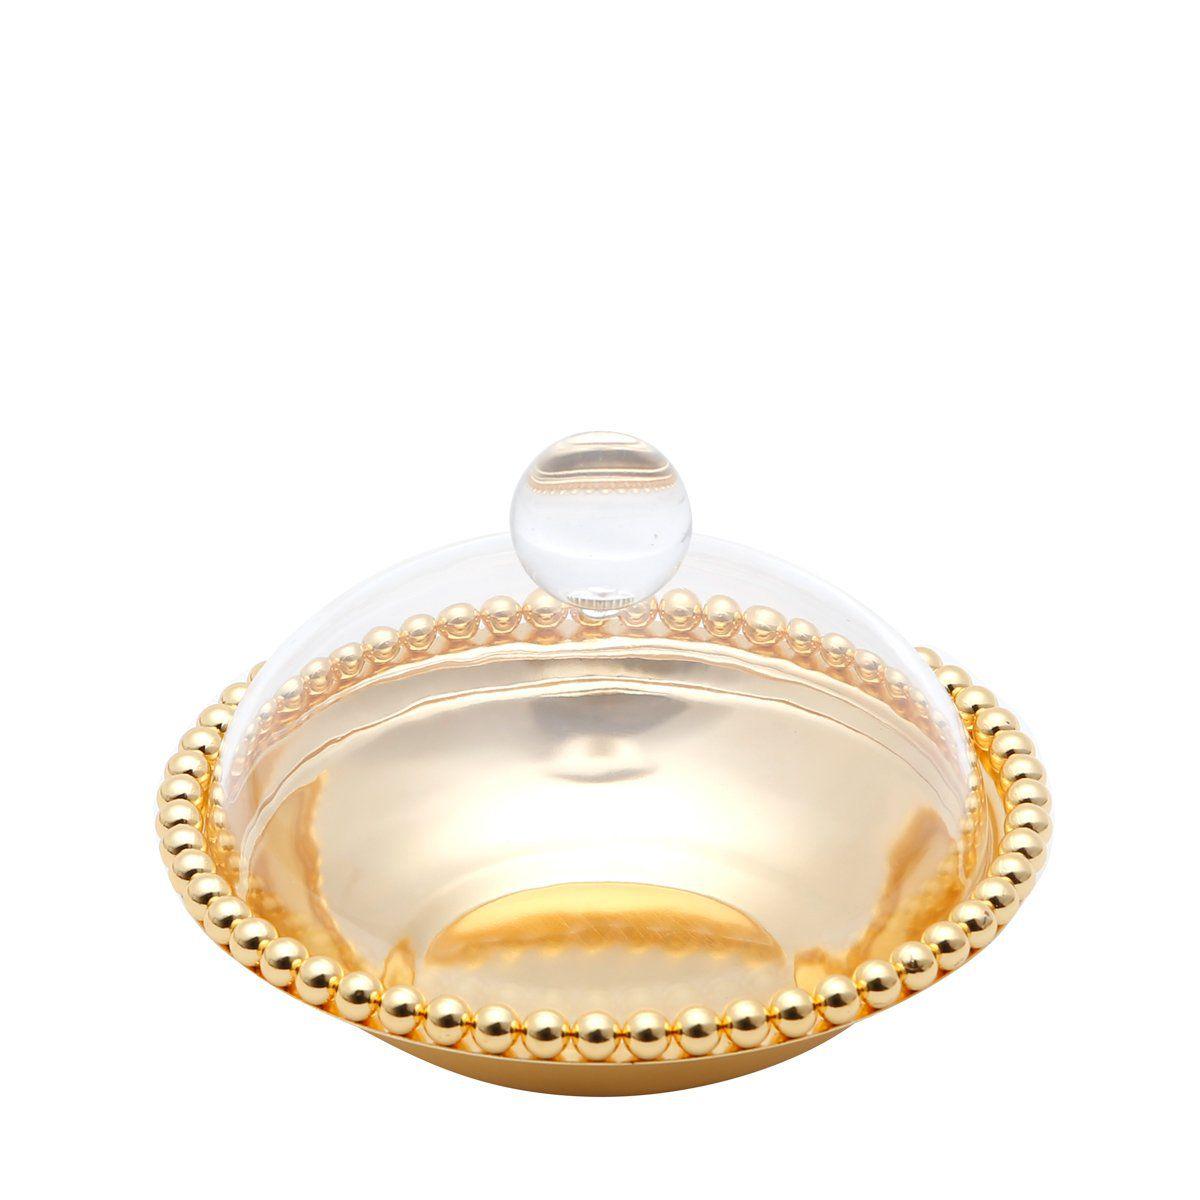 Bandeja redonda 16 cm de zamac dourado com tampa de acrílico Balls Lyor- L3753